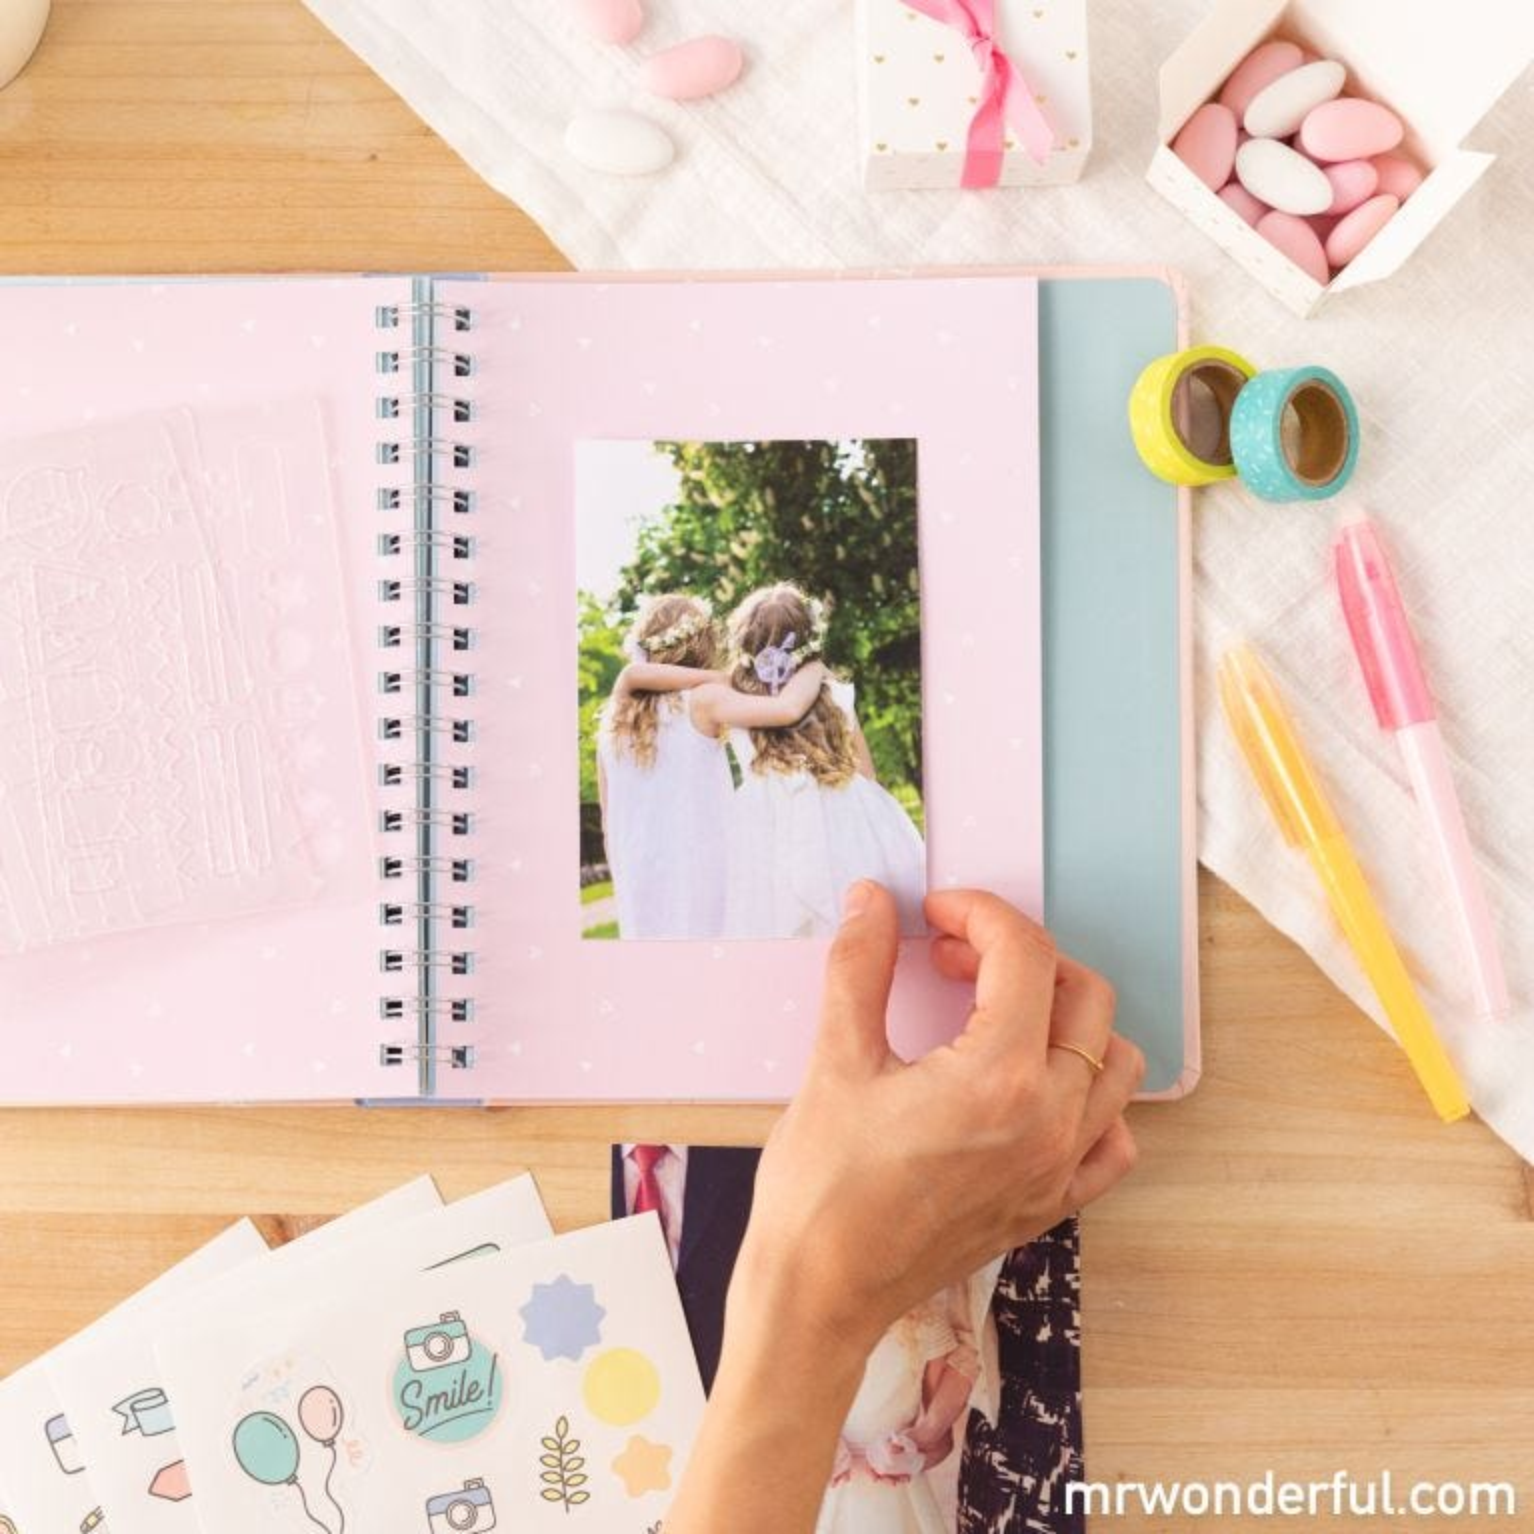 Kit scrapbooking para álbum de comunión - Rosa